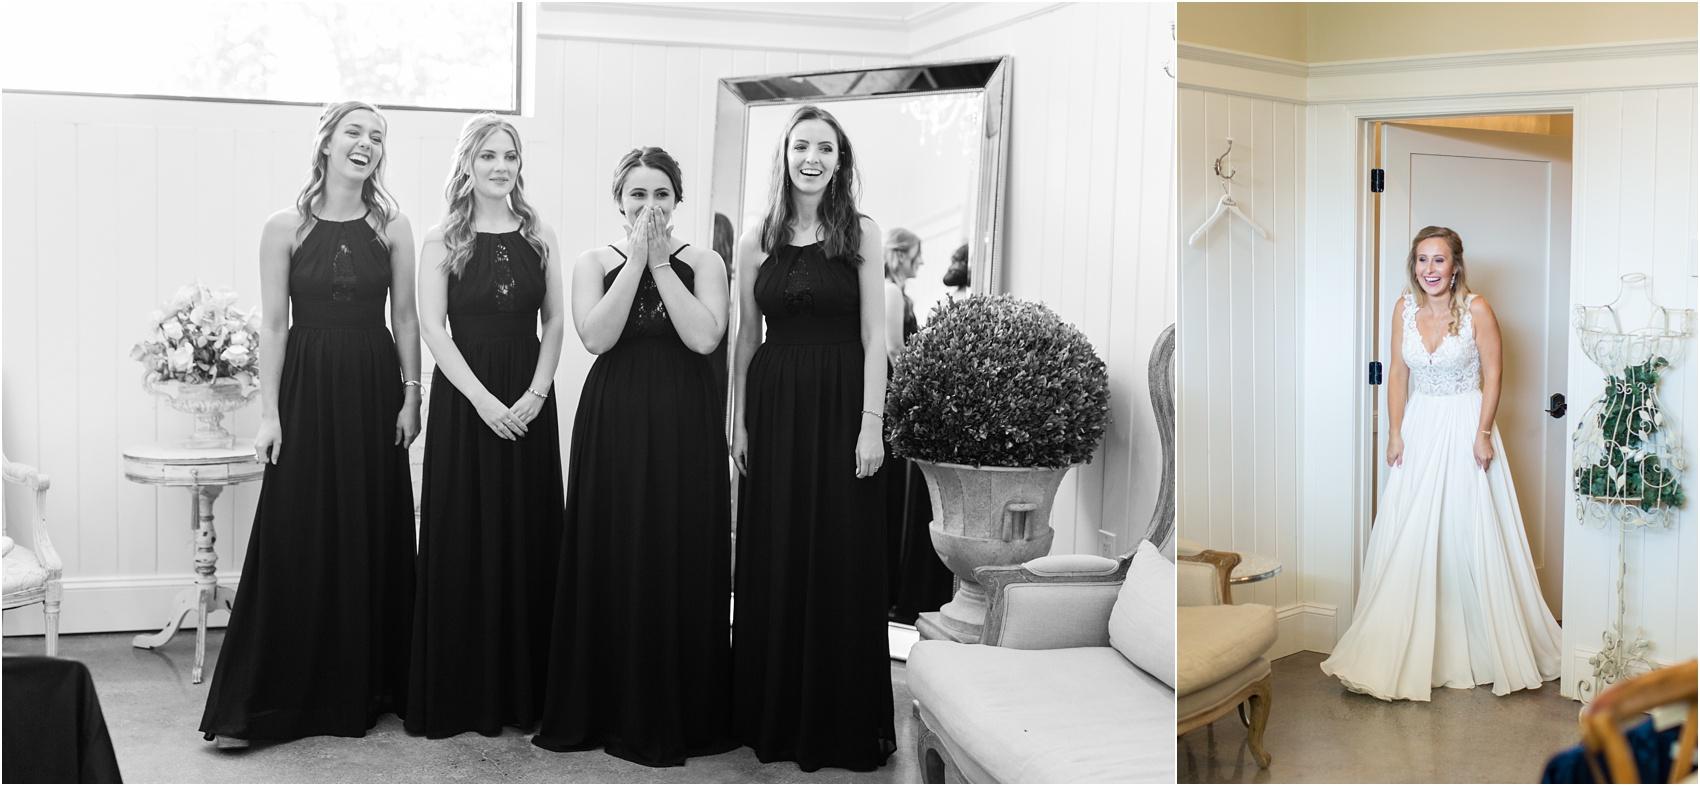 Savannah Eve Photography- Jurek-Woodworth Wedding- Sneak Peek-10.jpg